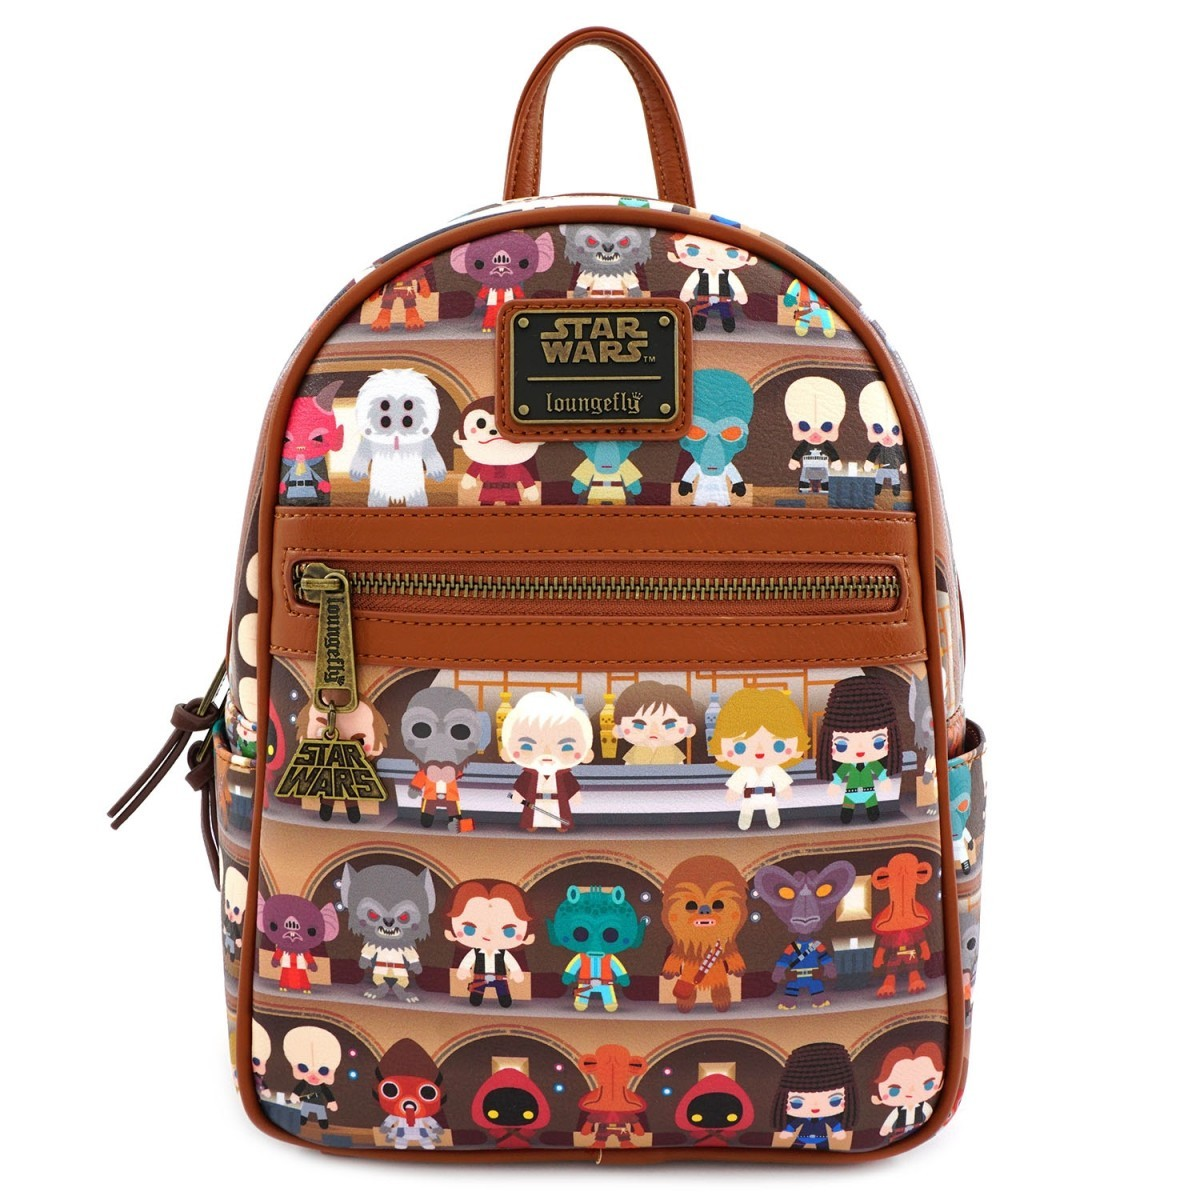 Loungefly: Star Wars - Cantina Chibi Mini Backpack image